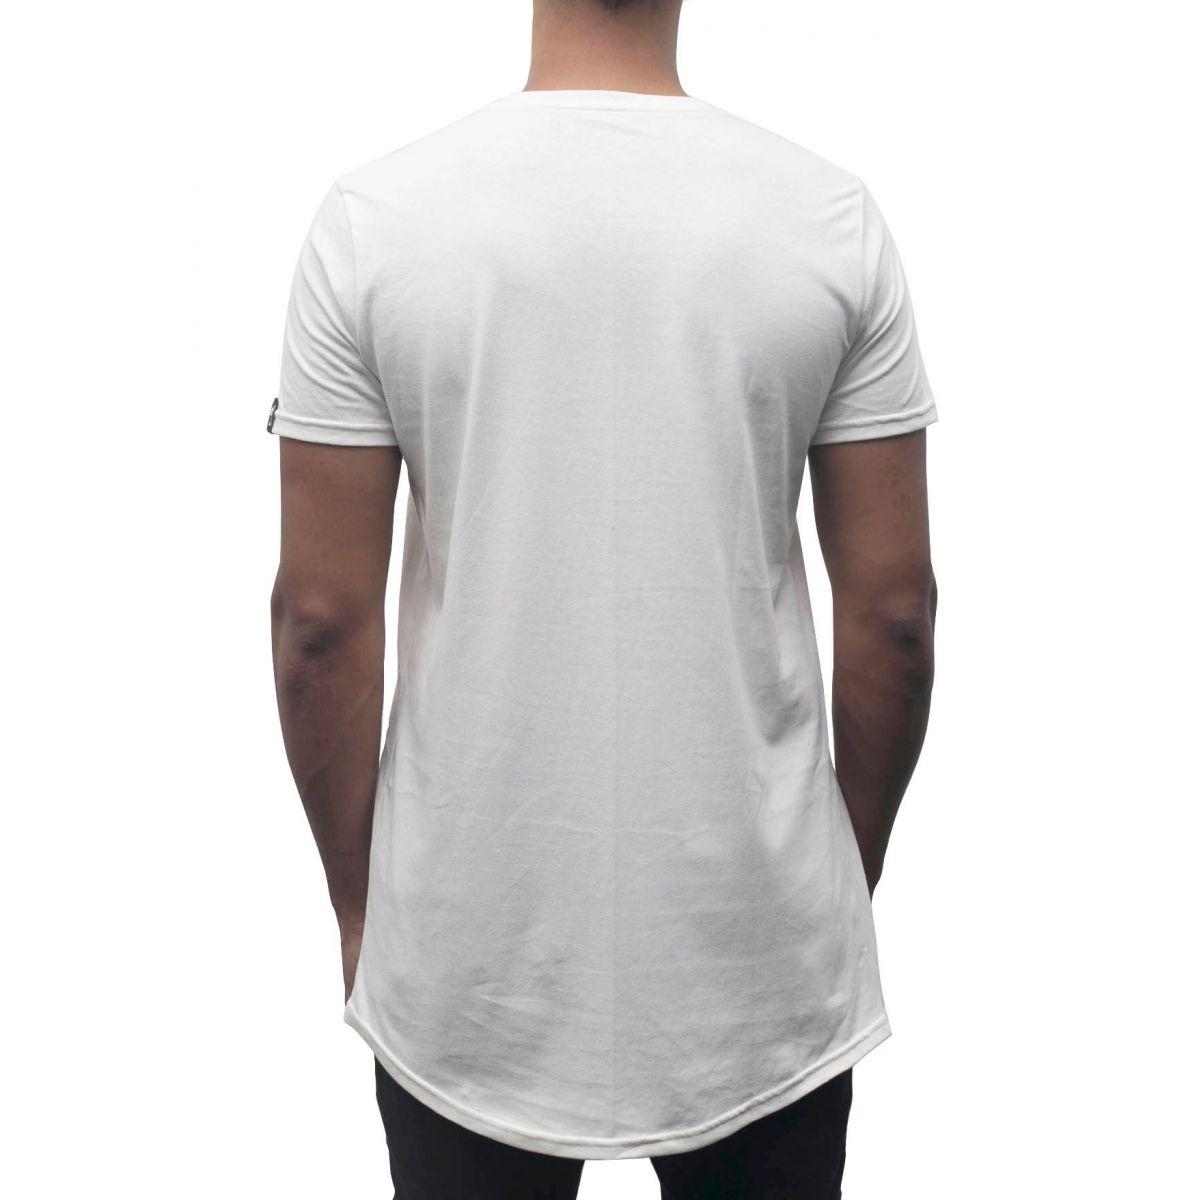 Camiseta Cloudman - Masculina  #REINODEPONTACABEÇA  - Jesuscopy